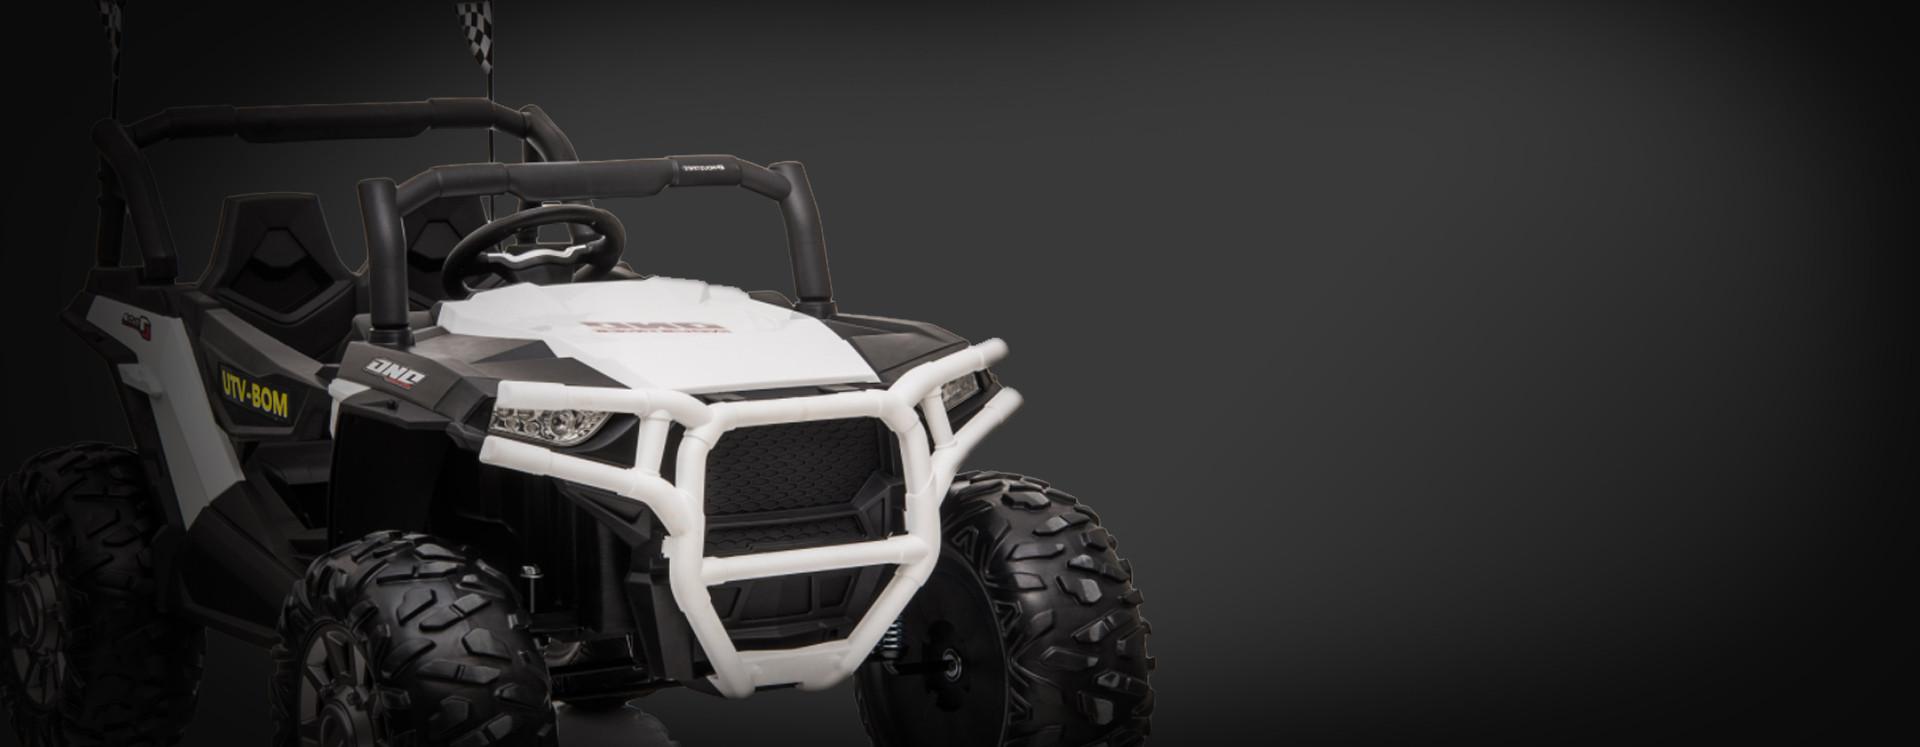 Xtreme BIG 24v Ride on Buggy Off Road UTV Jeep White